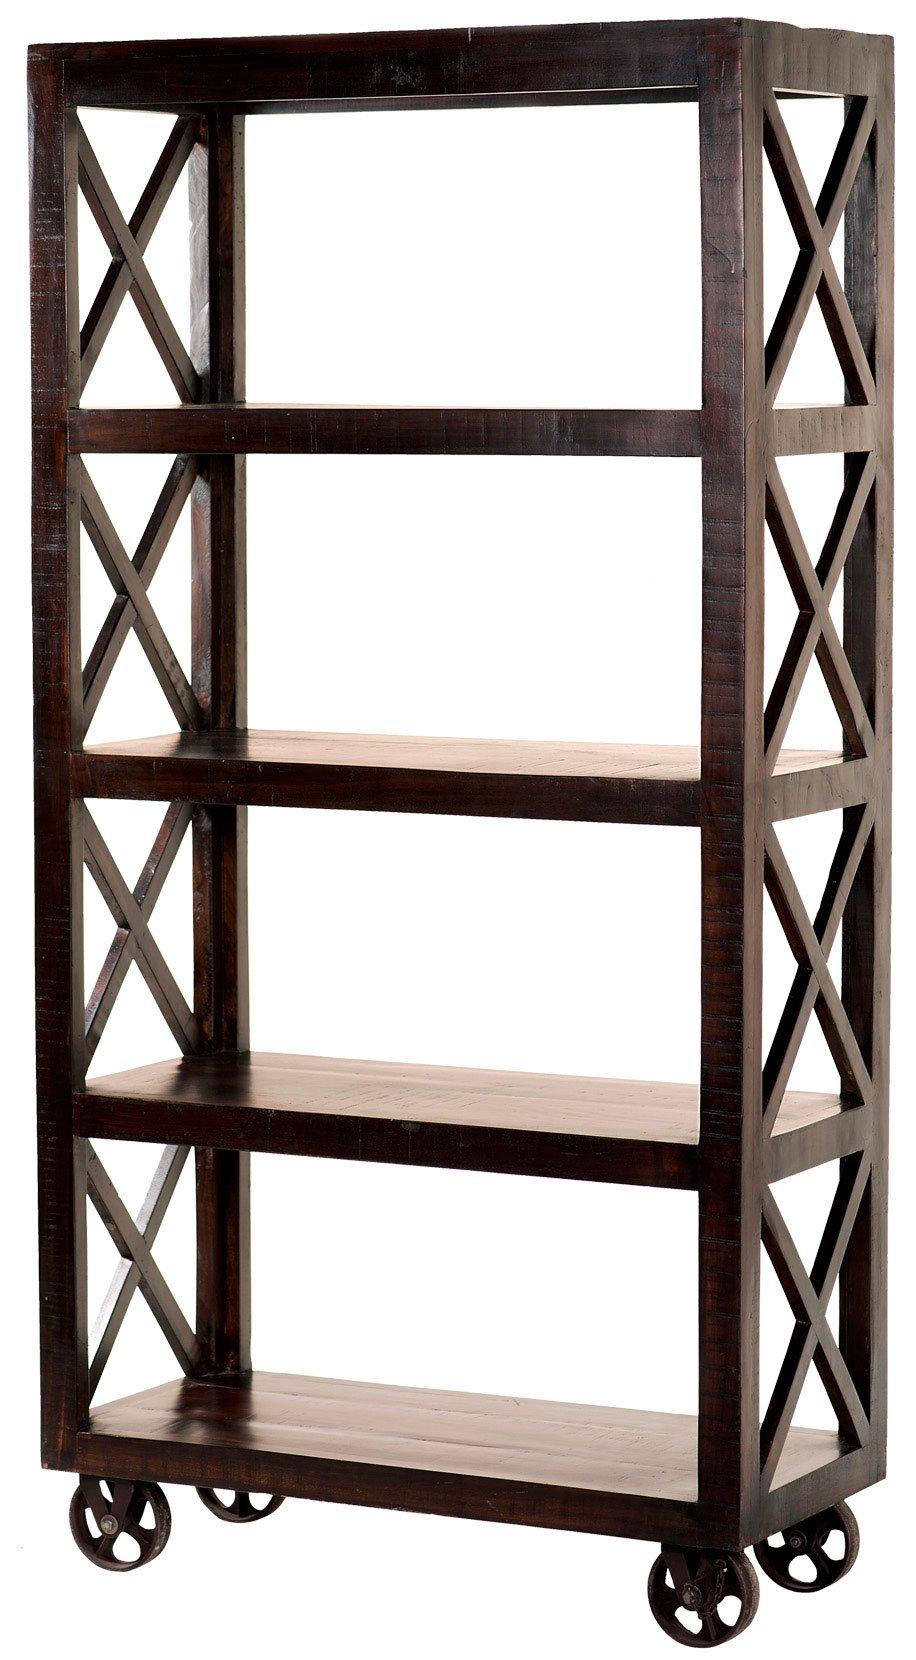 yosemite home decor yfur sba5394 espresso etagere bookcase. Black Bedroom Furniture Sets. Home Design Ideas